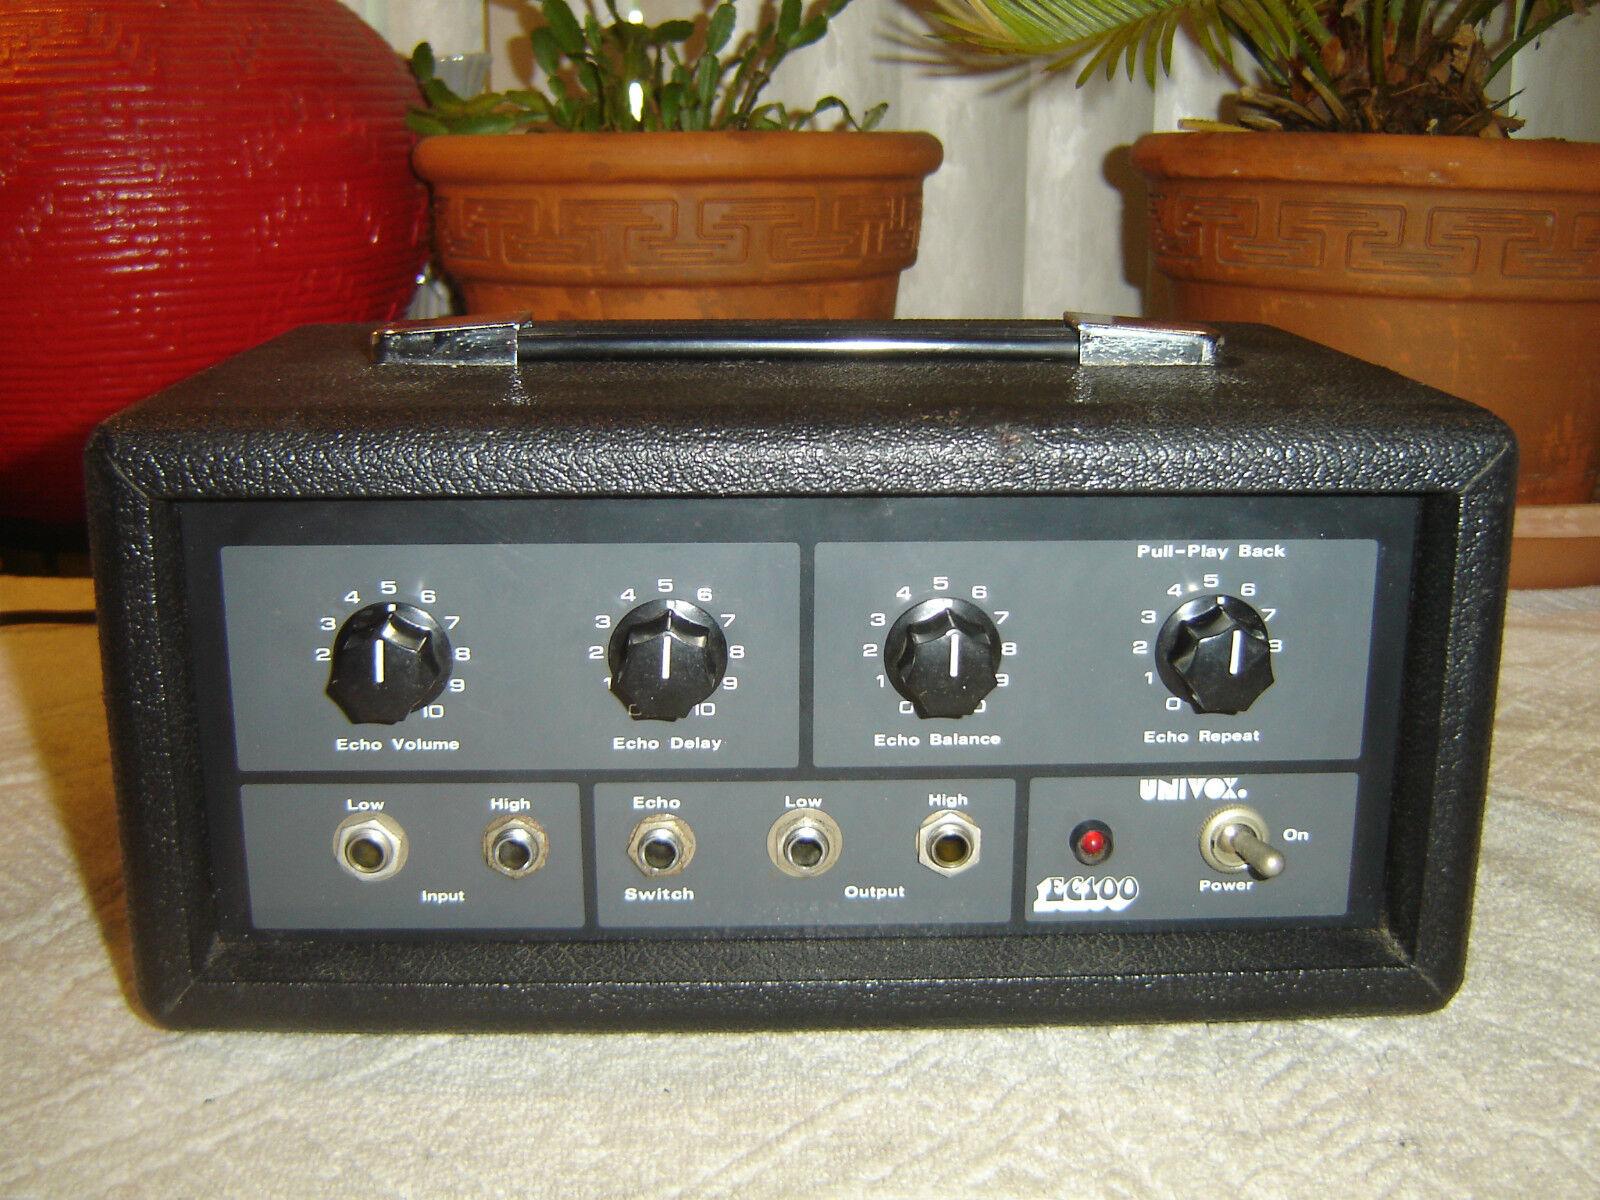 Univox EC100, Tape Echo Delay, with TC-1 Tape, Vintage Unit, As Is